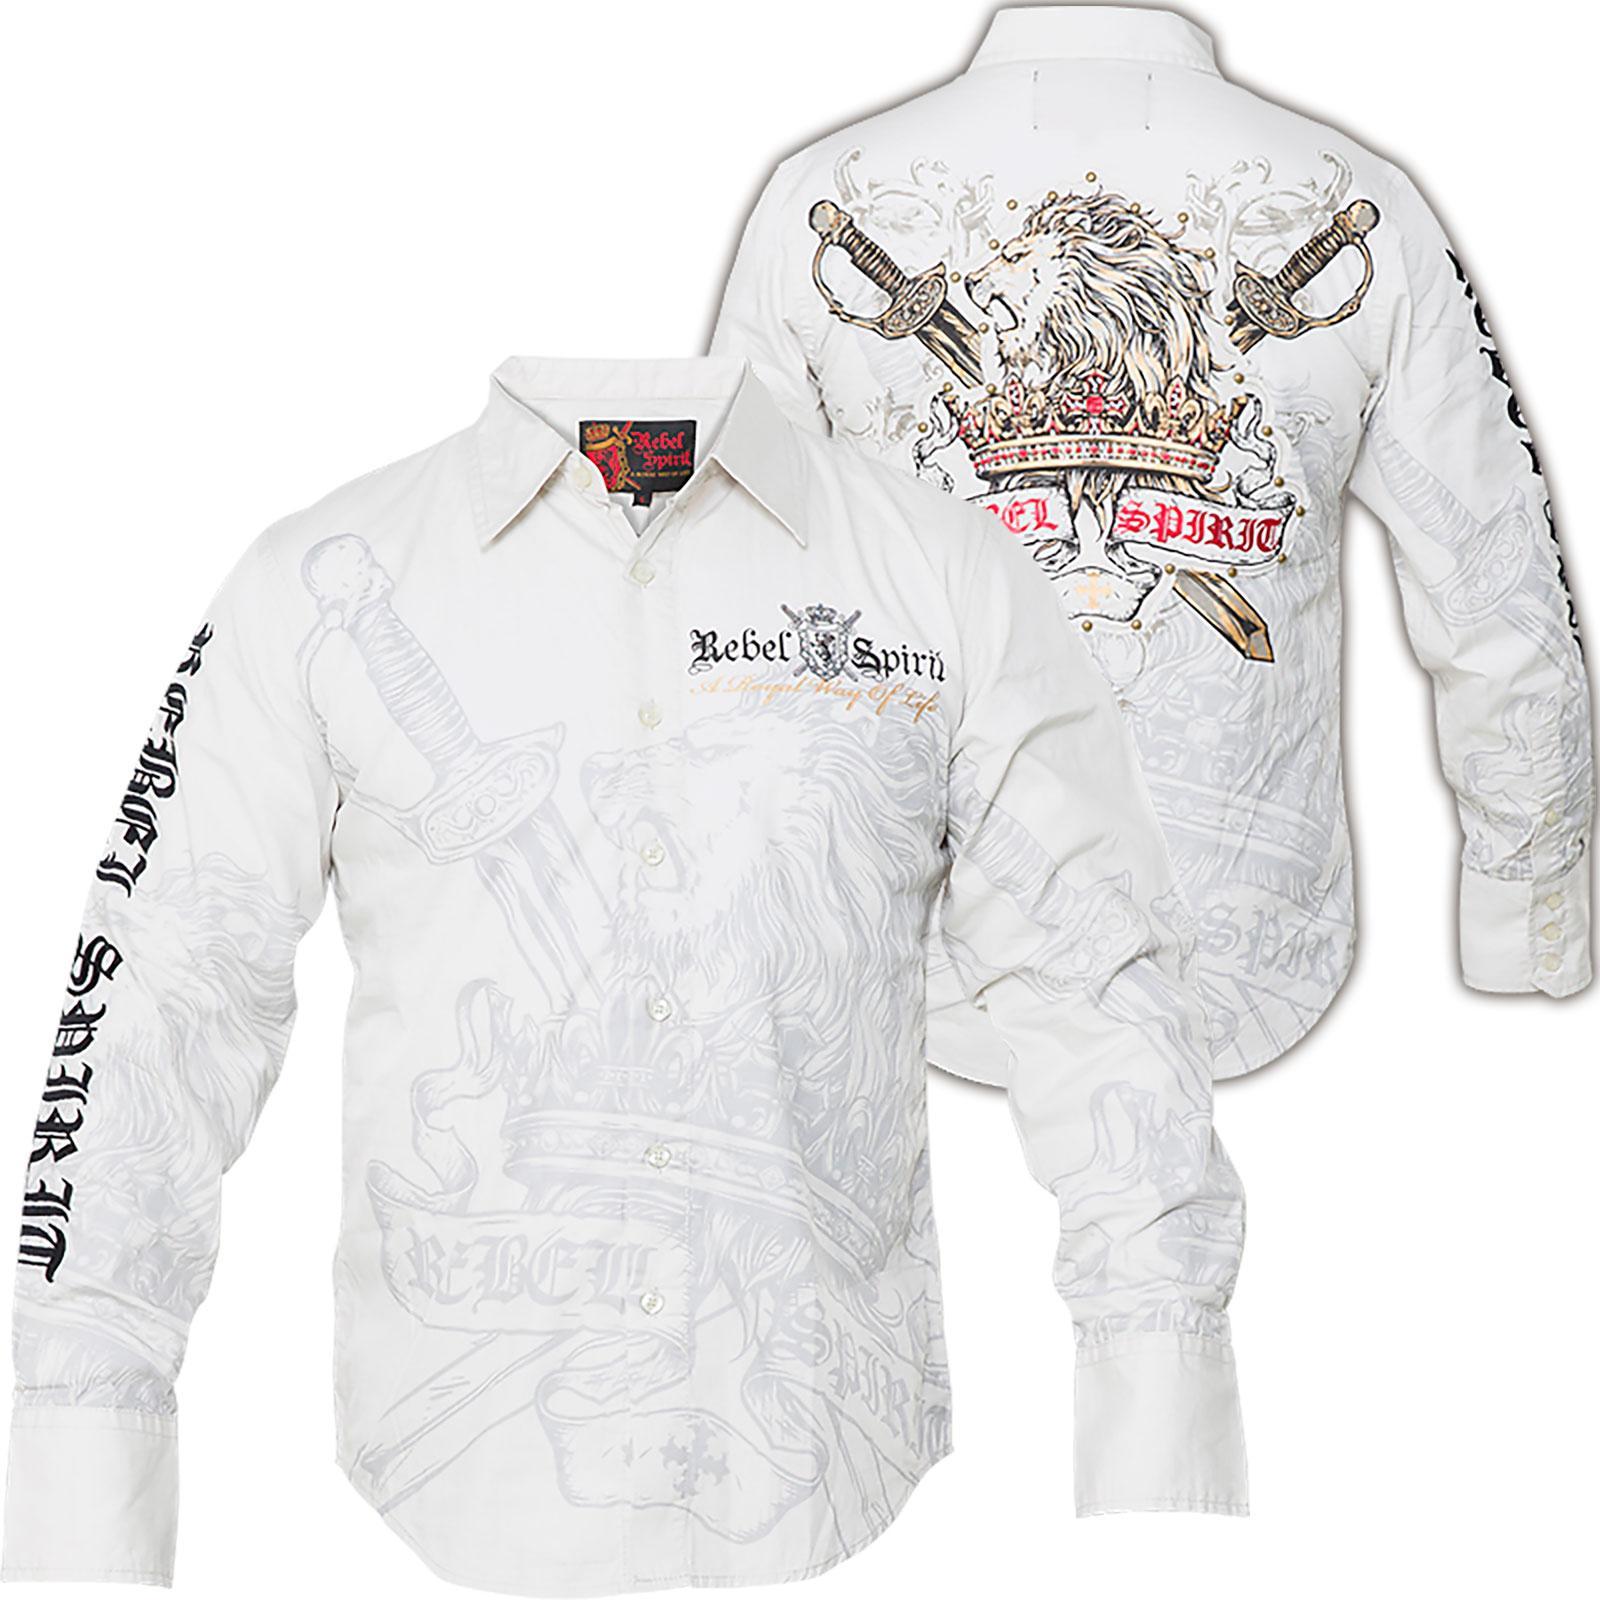 rebel spirit ls shirt lsw121290 shirt with large prints